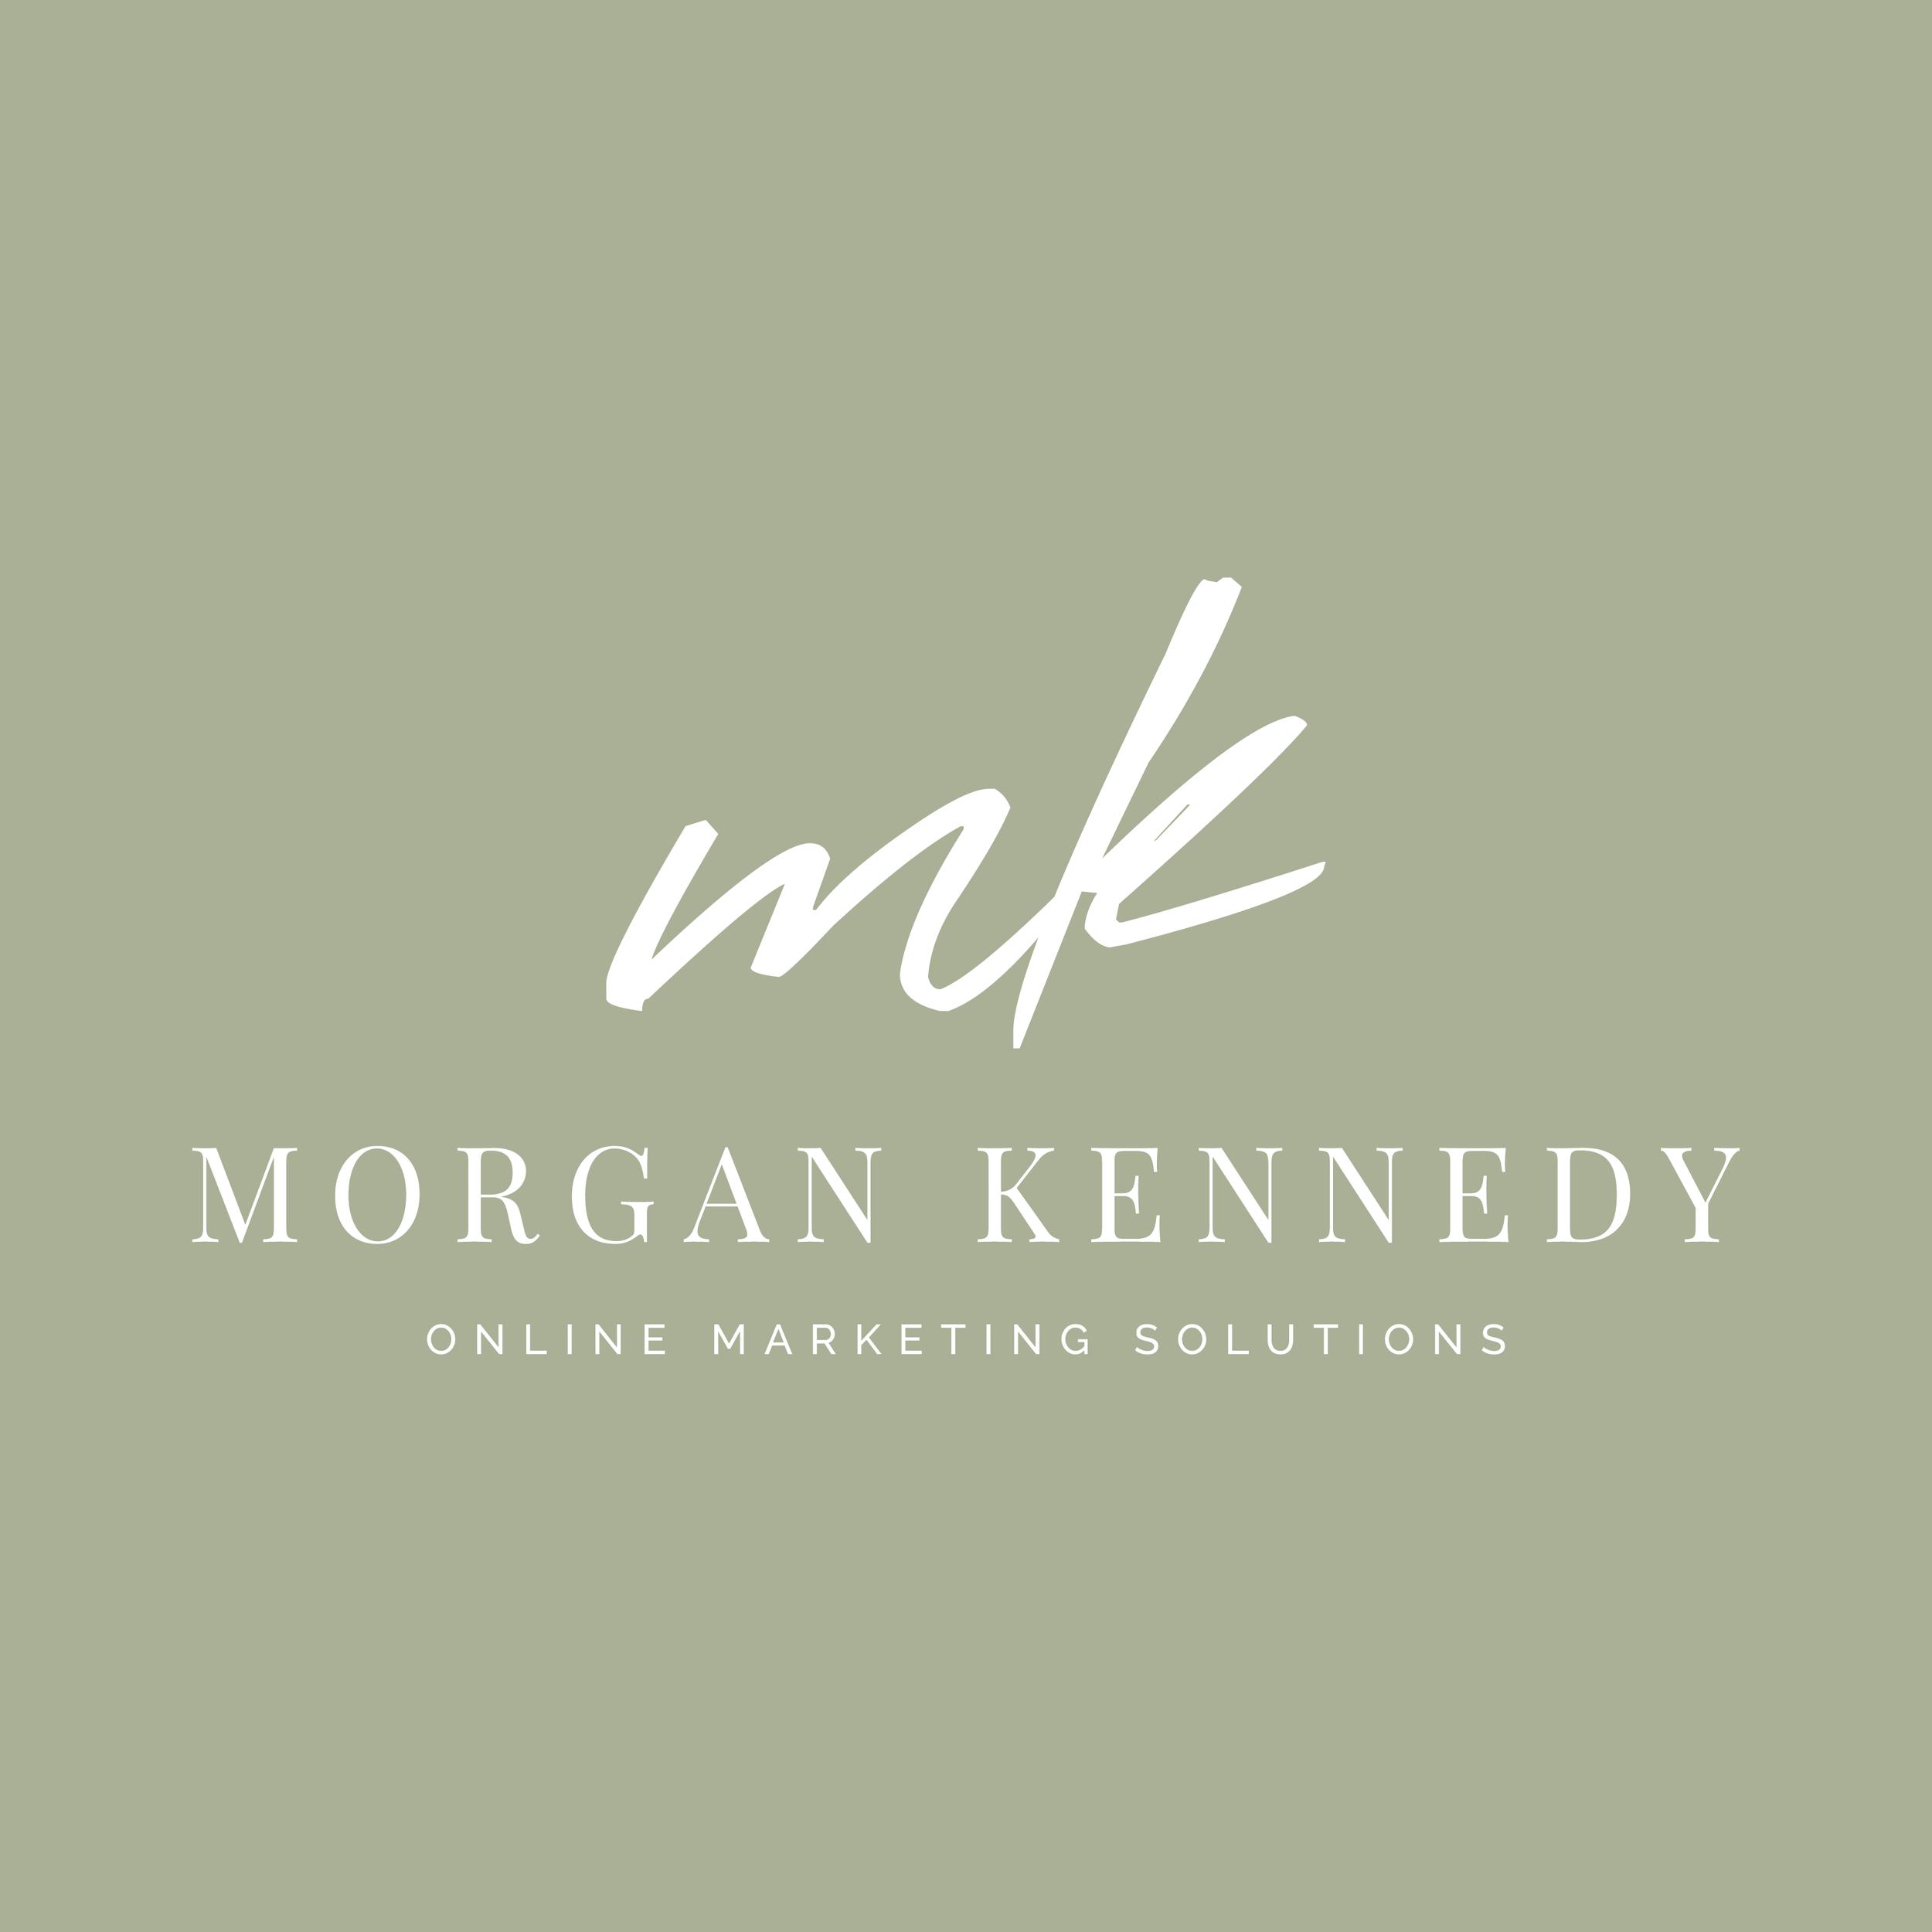 Morgan Kennedy Online Solutions    b  rand // print